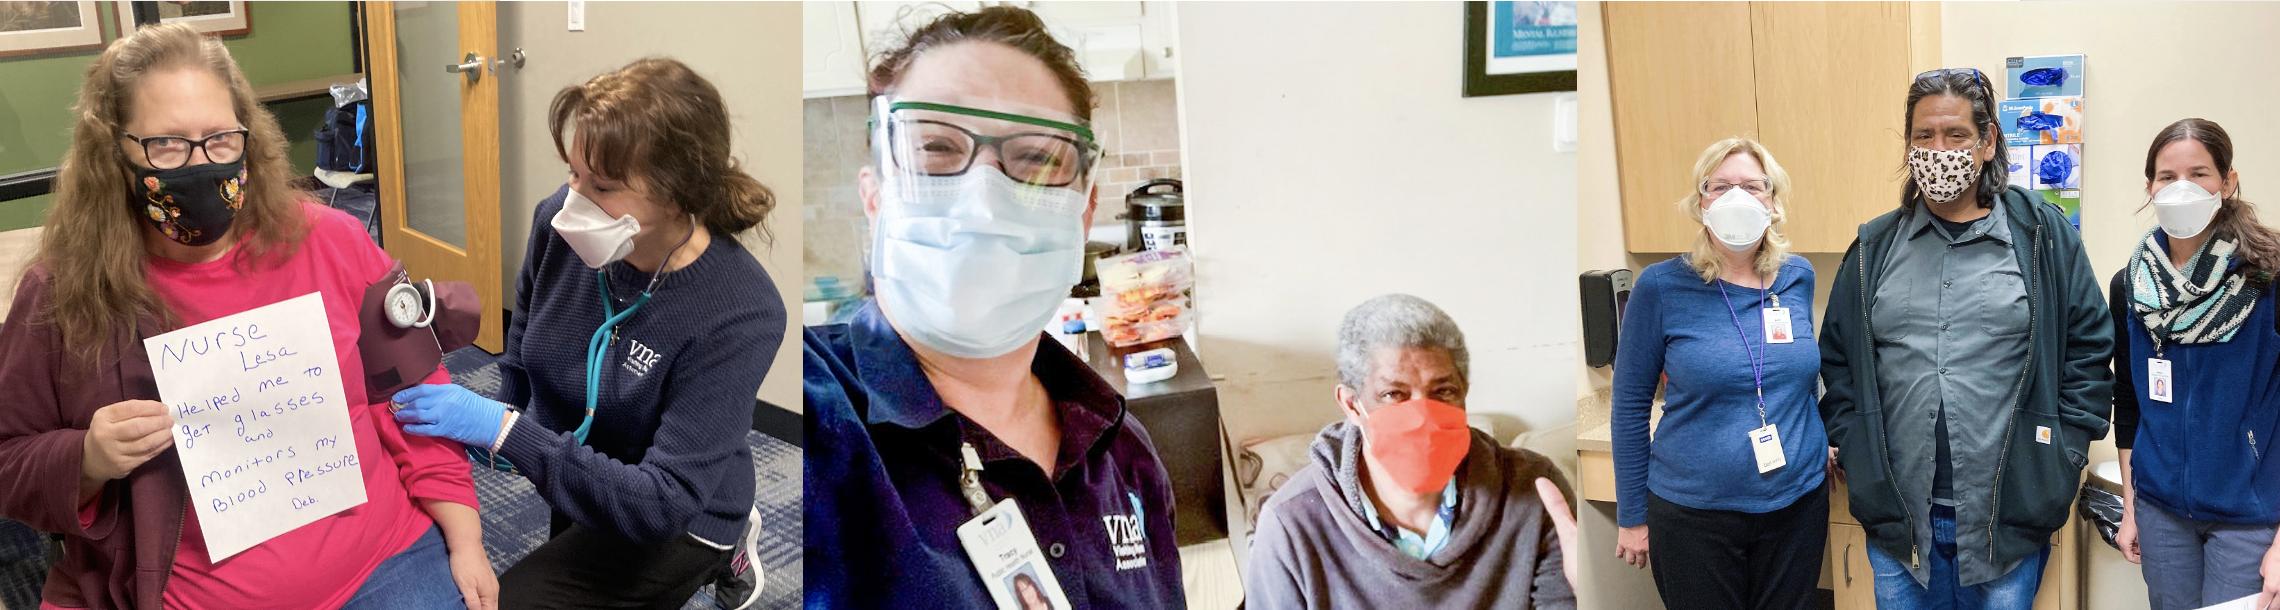 VNA shelter nurses with homeless shelter clients